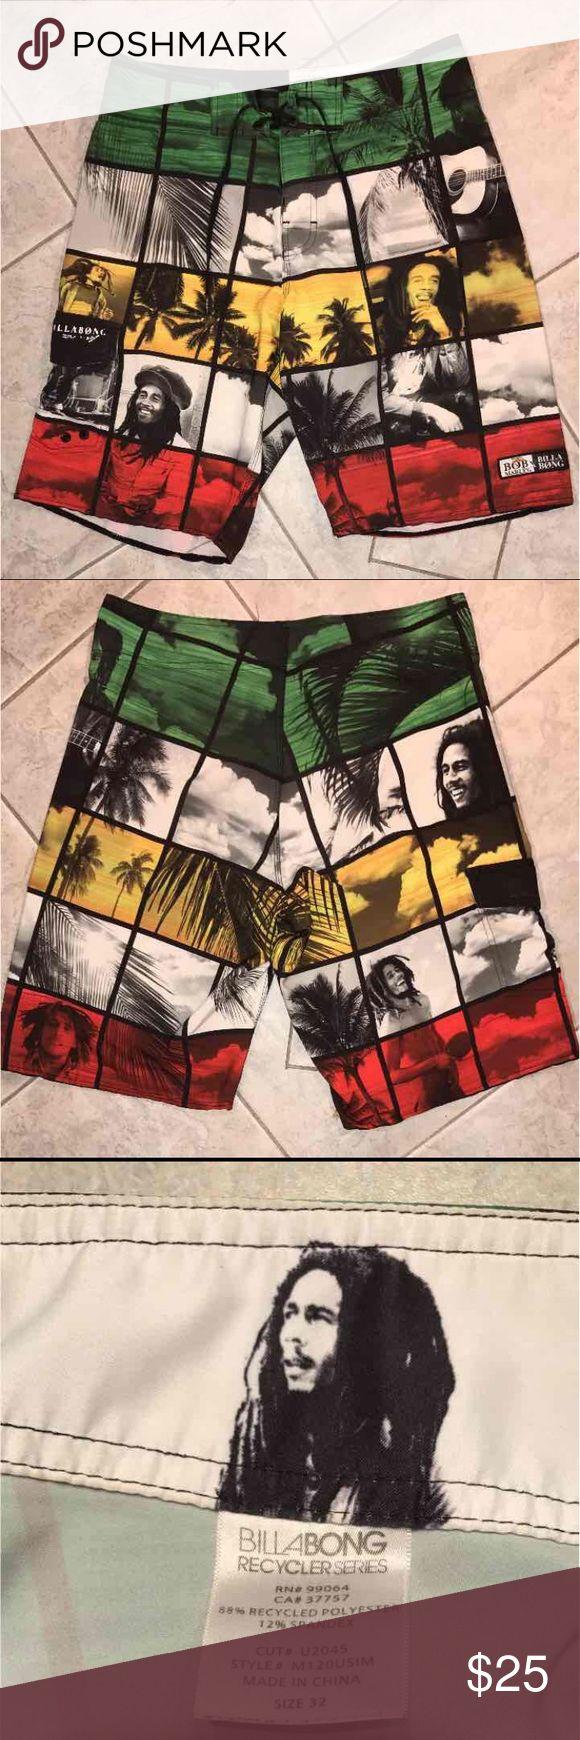 Bob Marley men's swimsuit Worn a few times still in great condition Billabong Swim Board Shorts